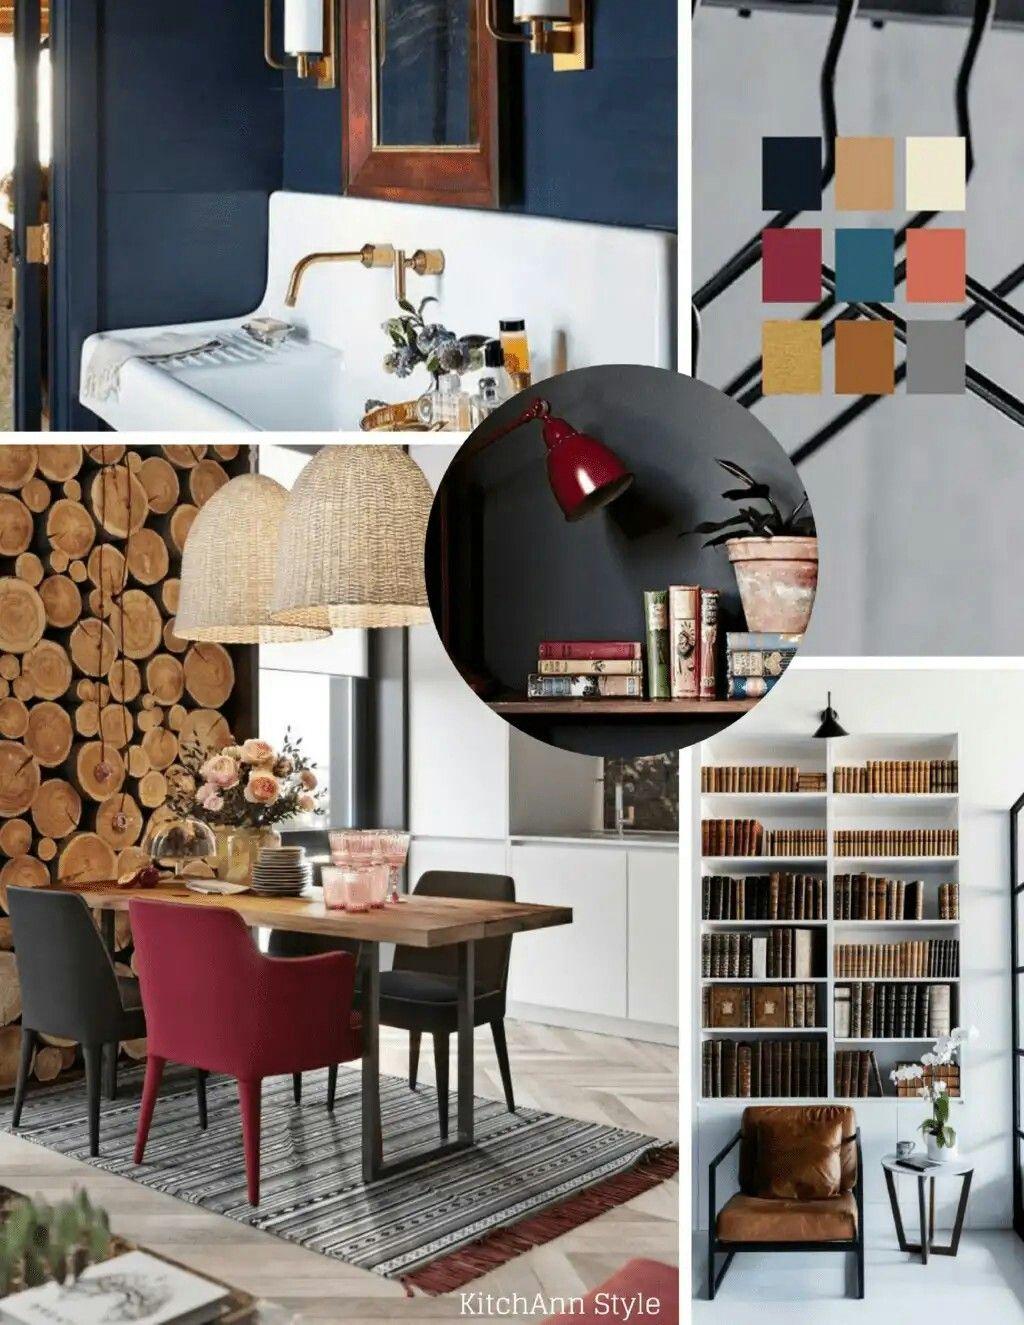 Pantoneview Home Interiors Classico 2019 Color Palette Inspiration